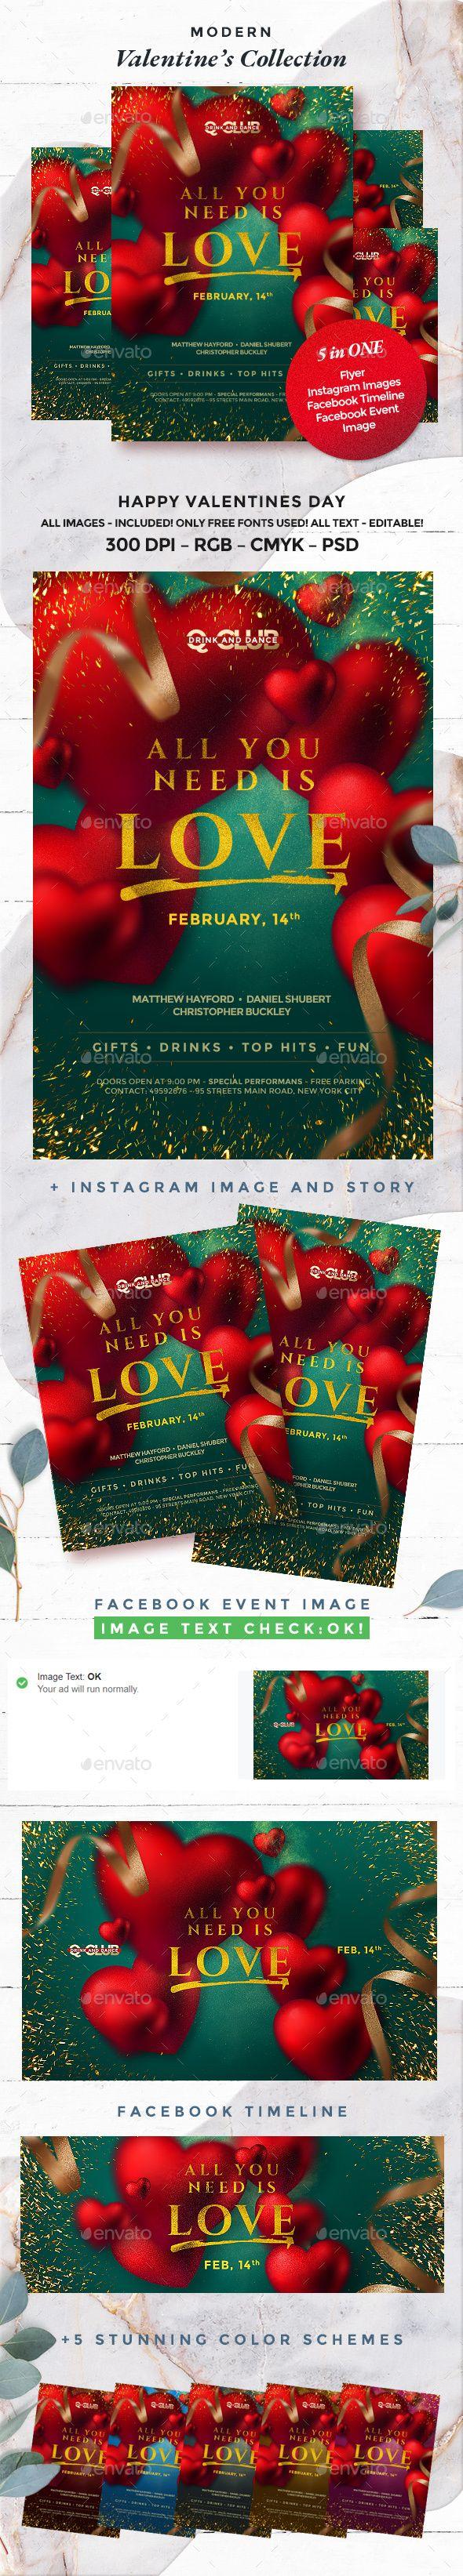 Valentines Flyer Instagram Image Instagram Story